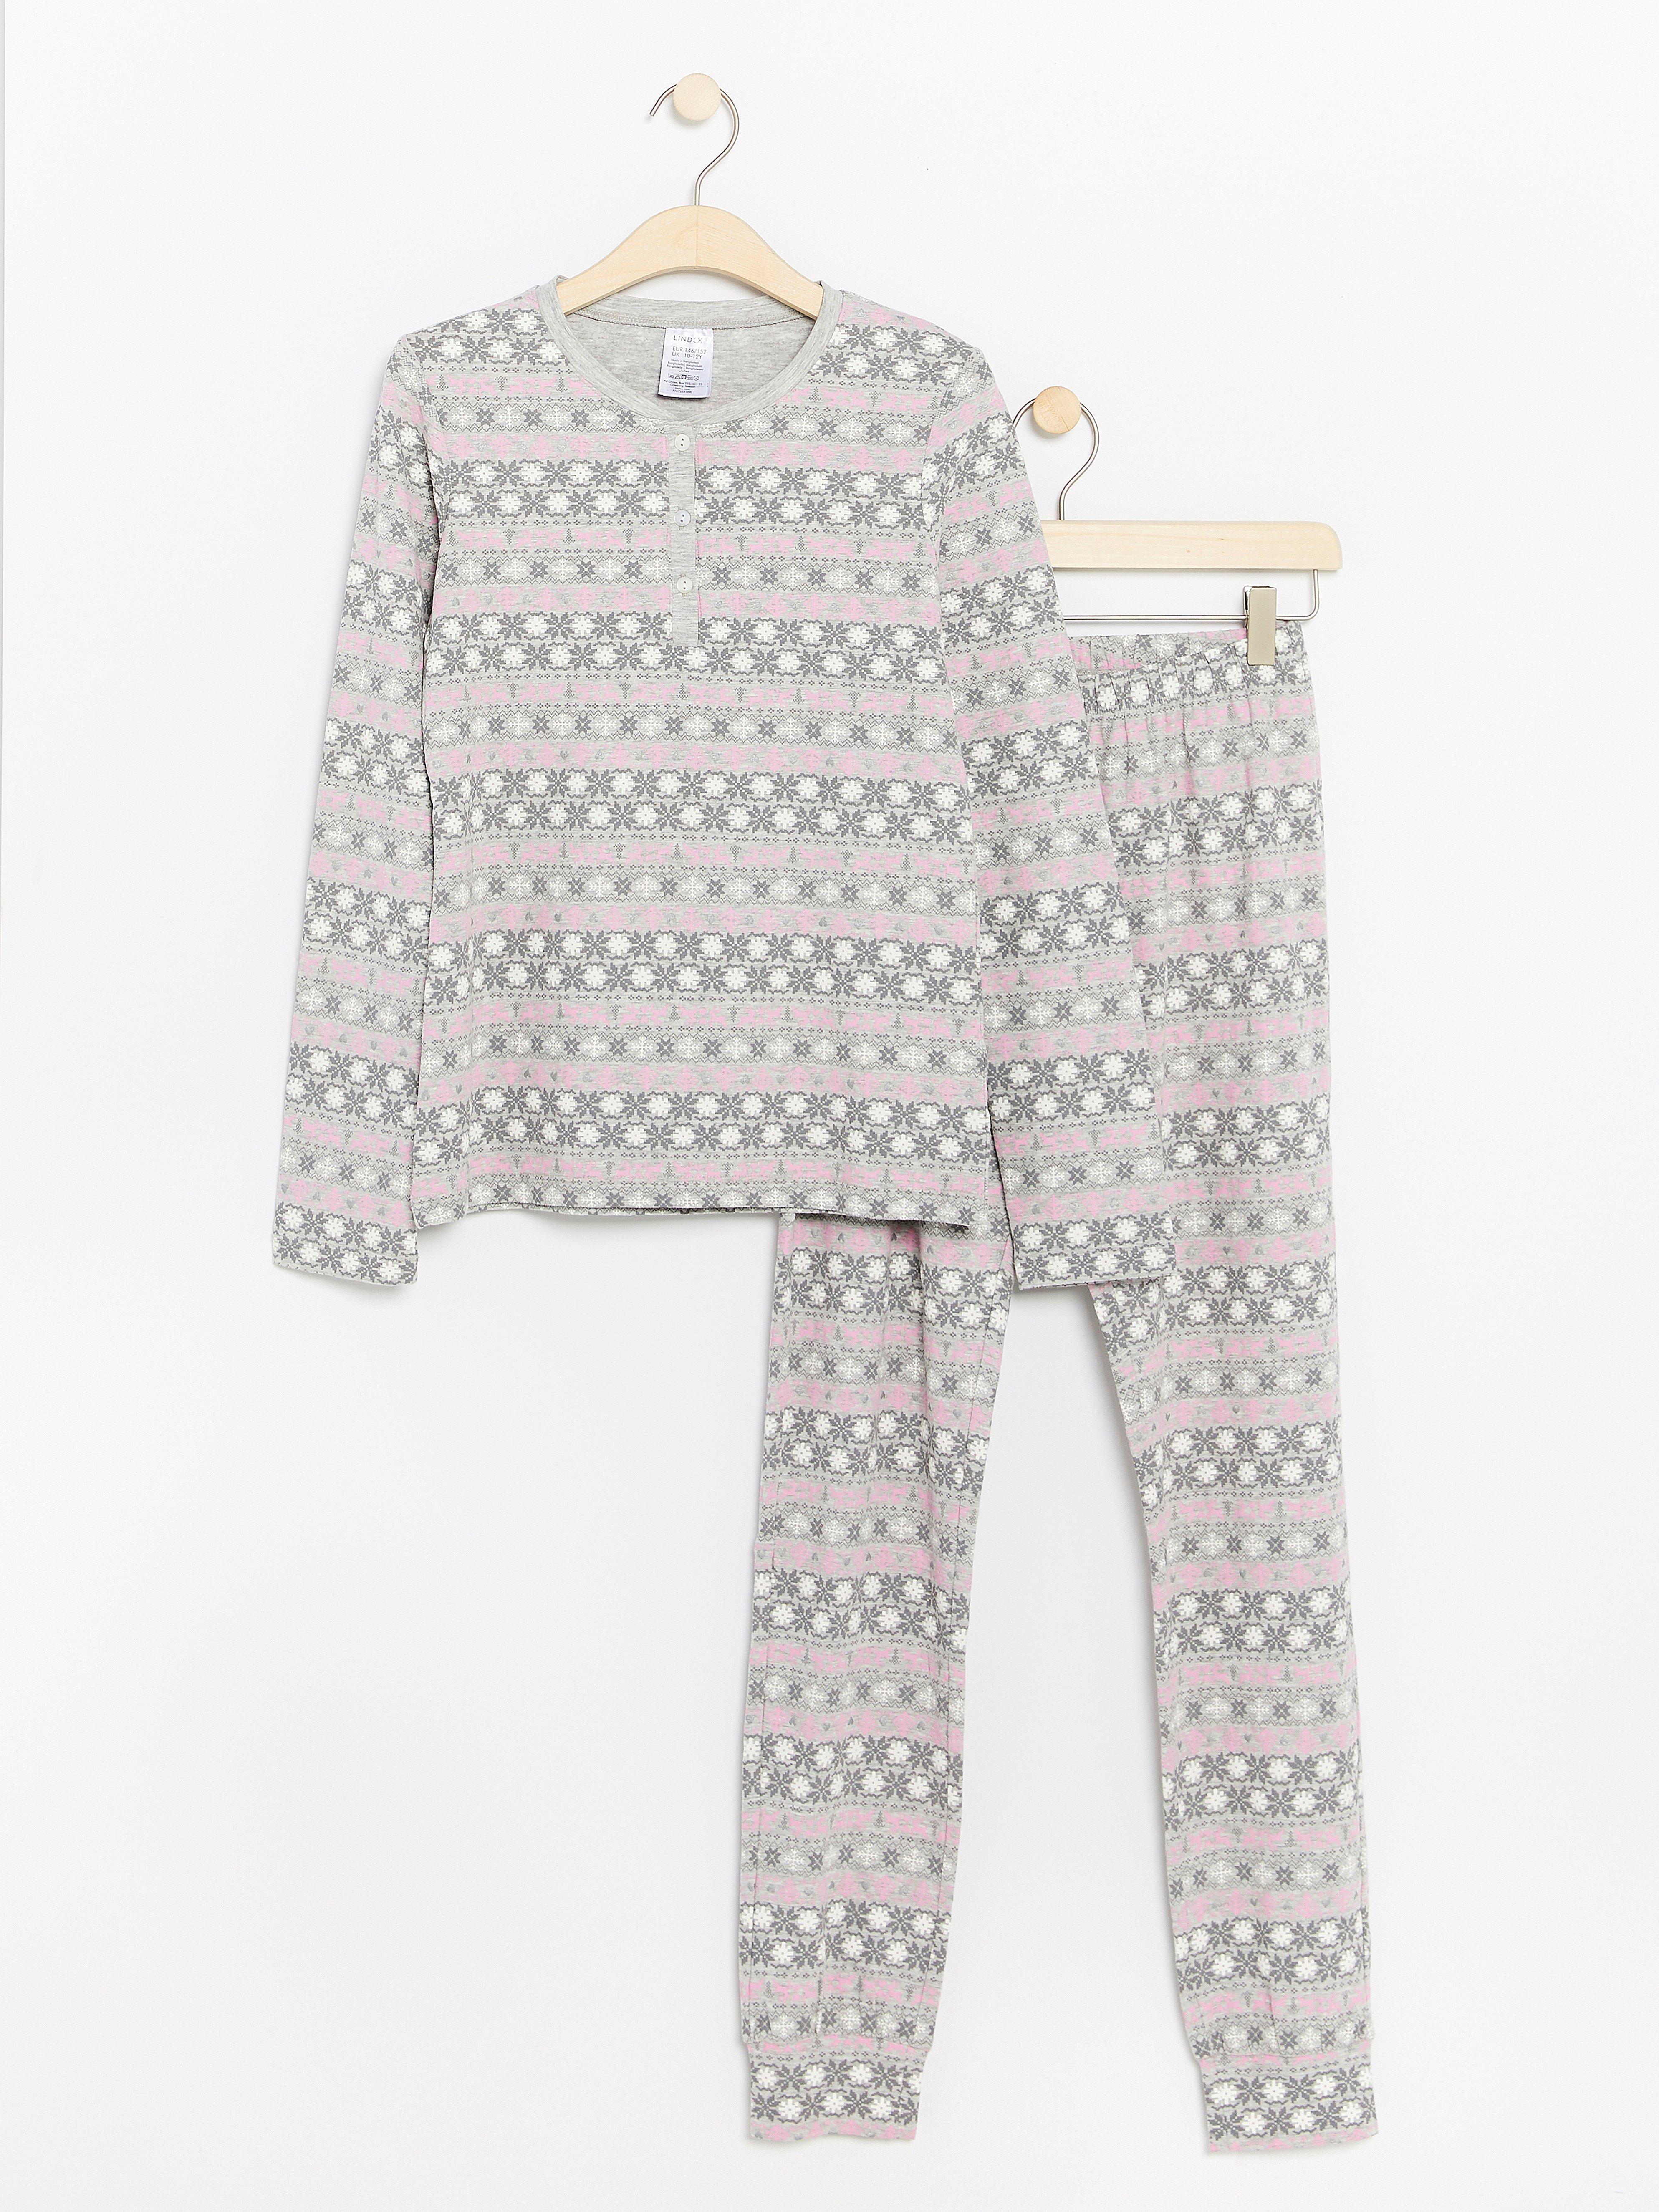 Mönstrad pyjamas Lindex - KompisShopping 6e290598255c2